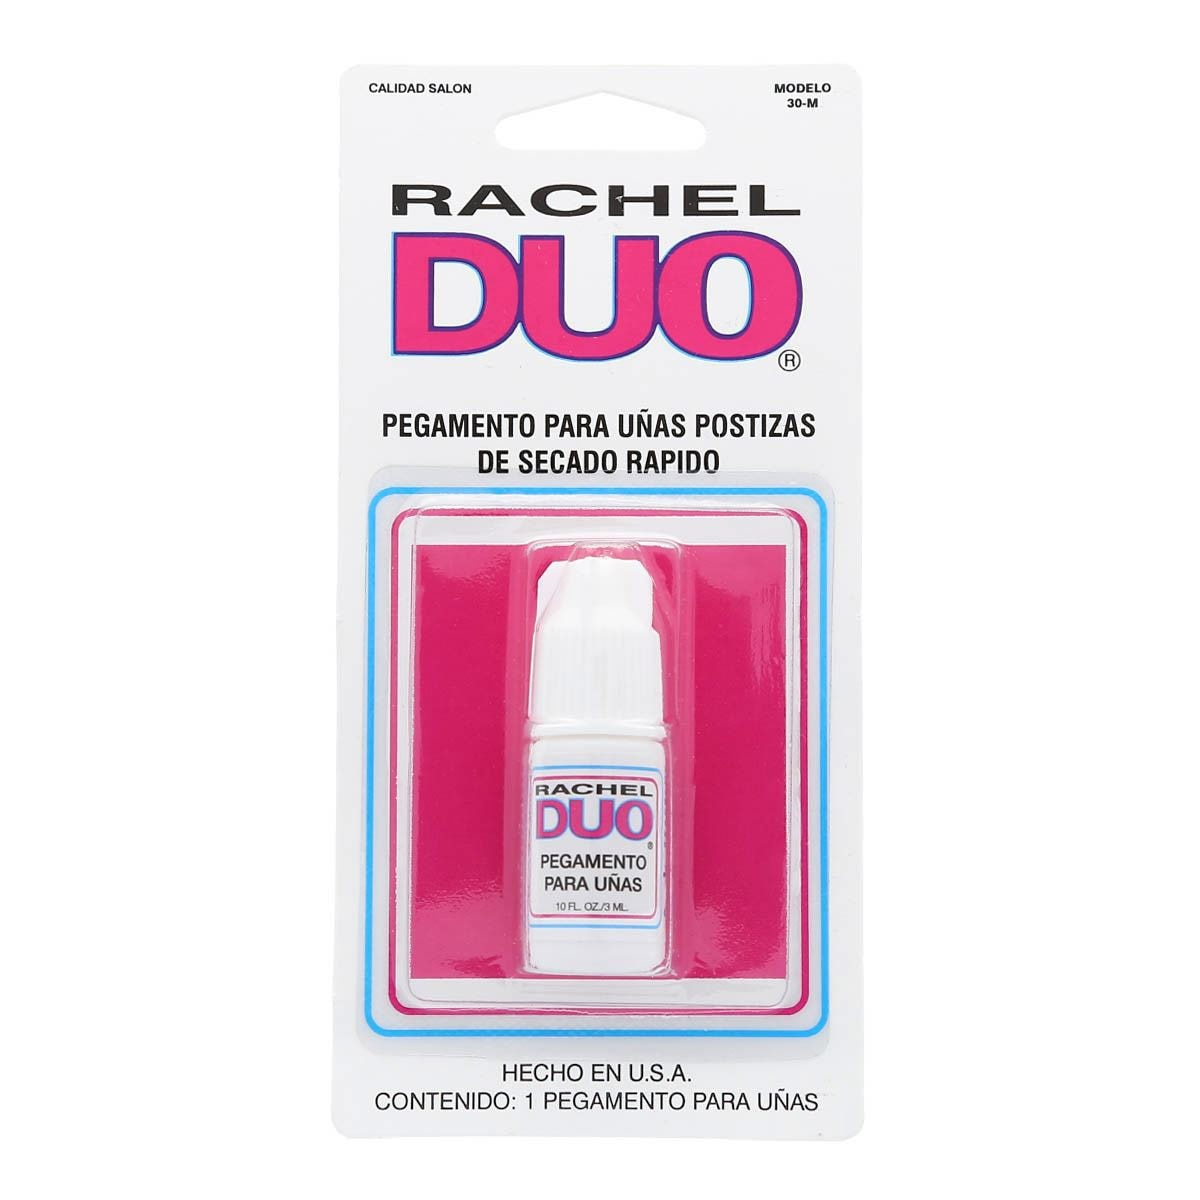 Pegamento goteo para uñas postizas Rachel Duo 30-M